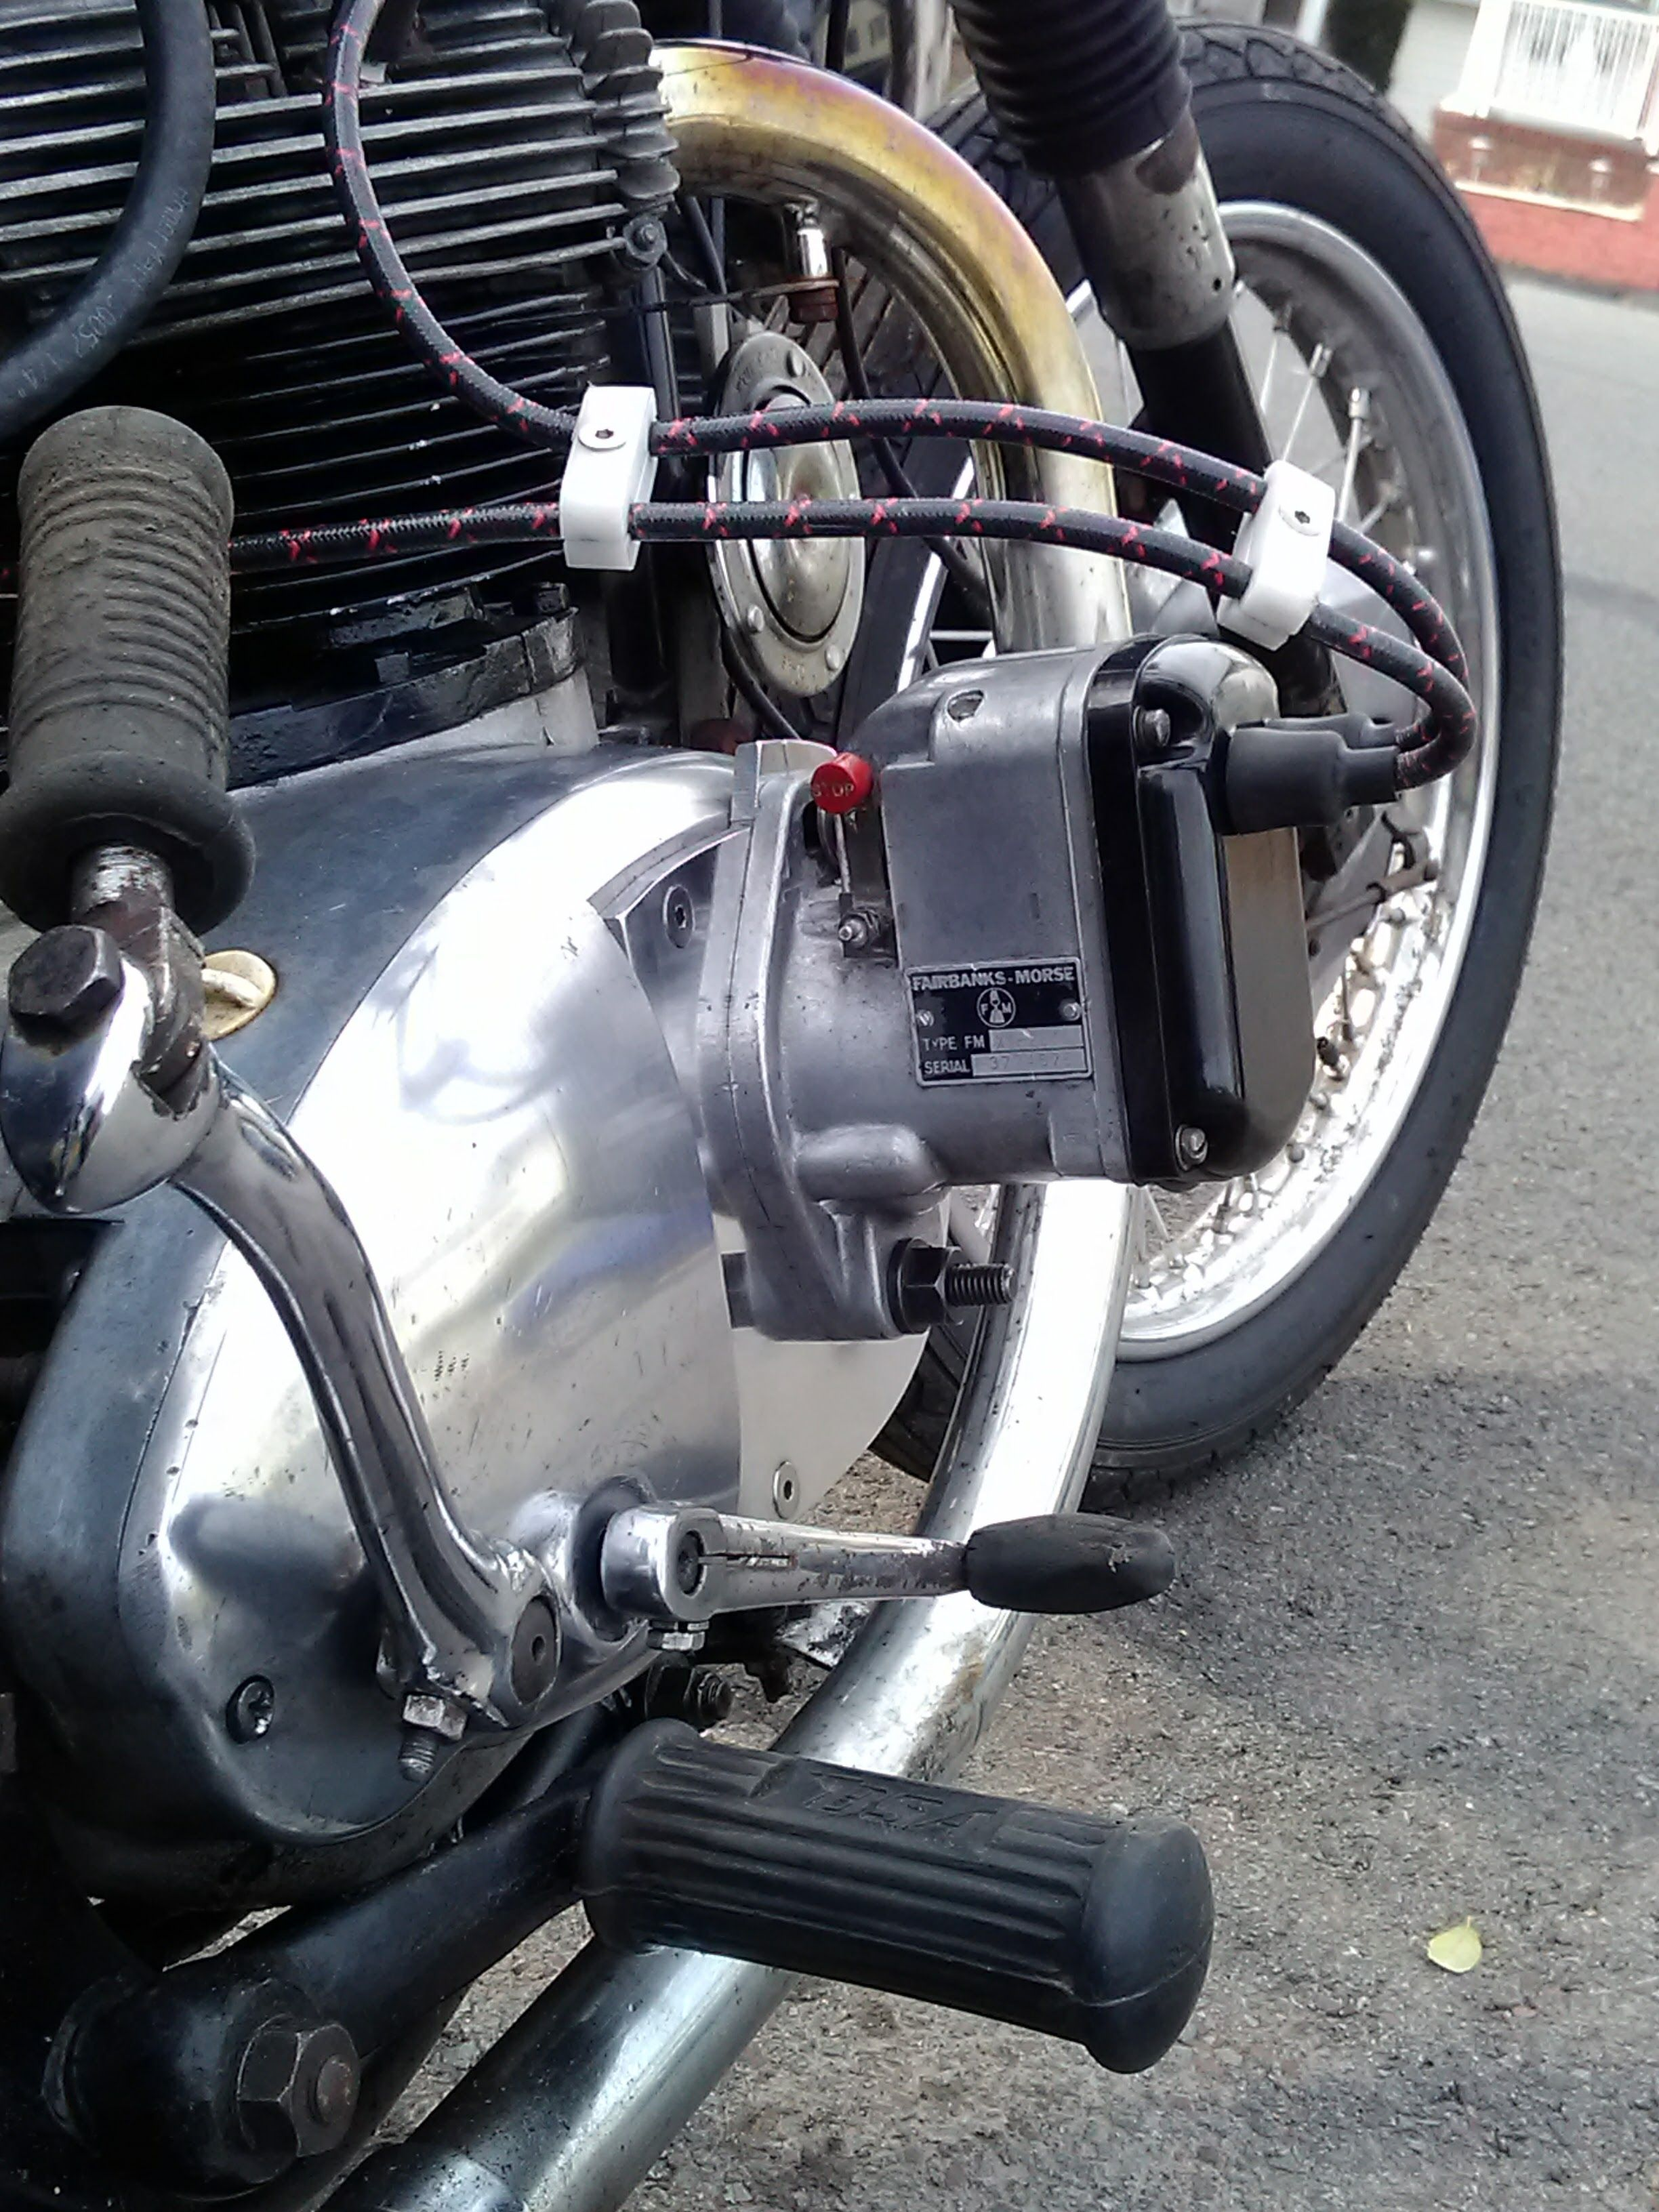 1969 bsa motorcycle magneto mod  [ 2448 x 3264 Pixel ]